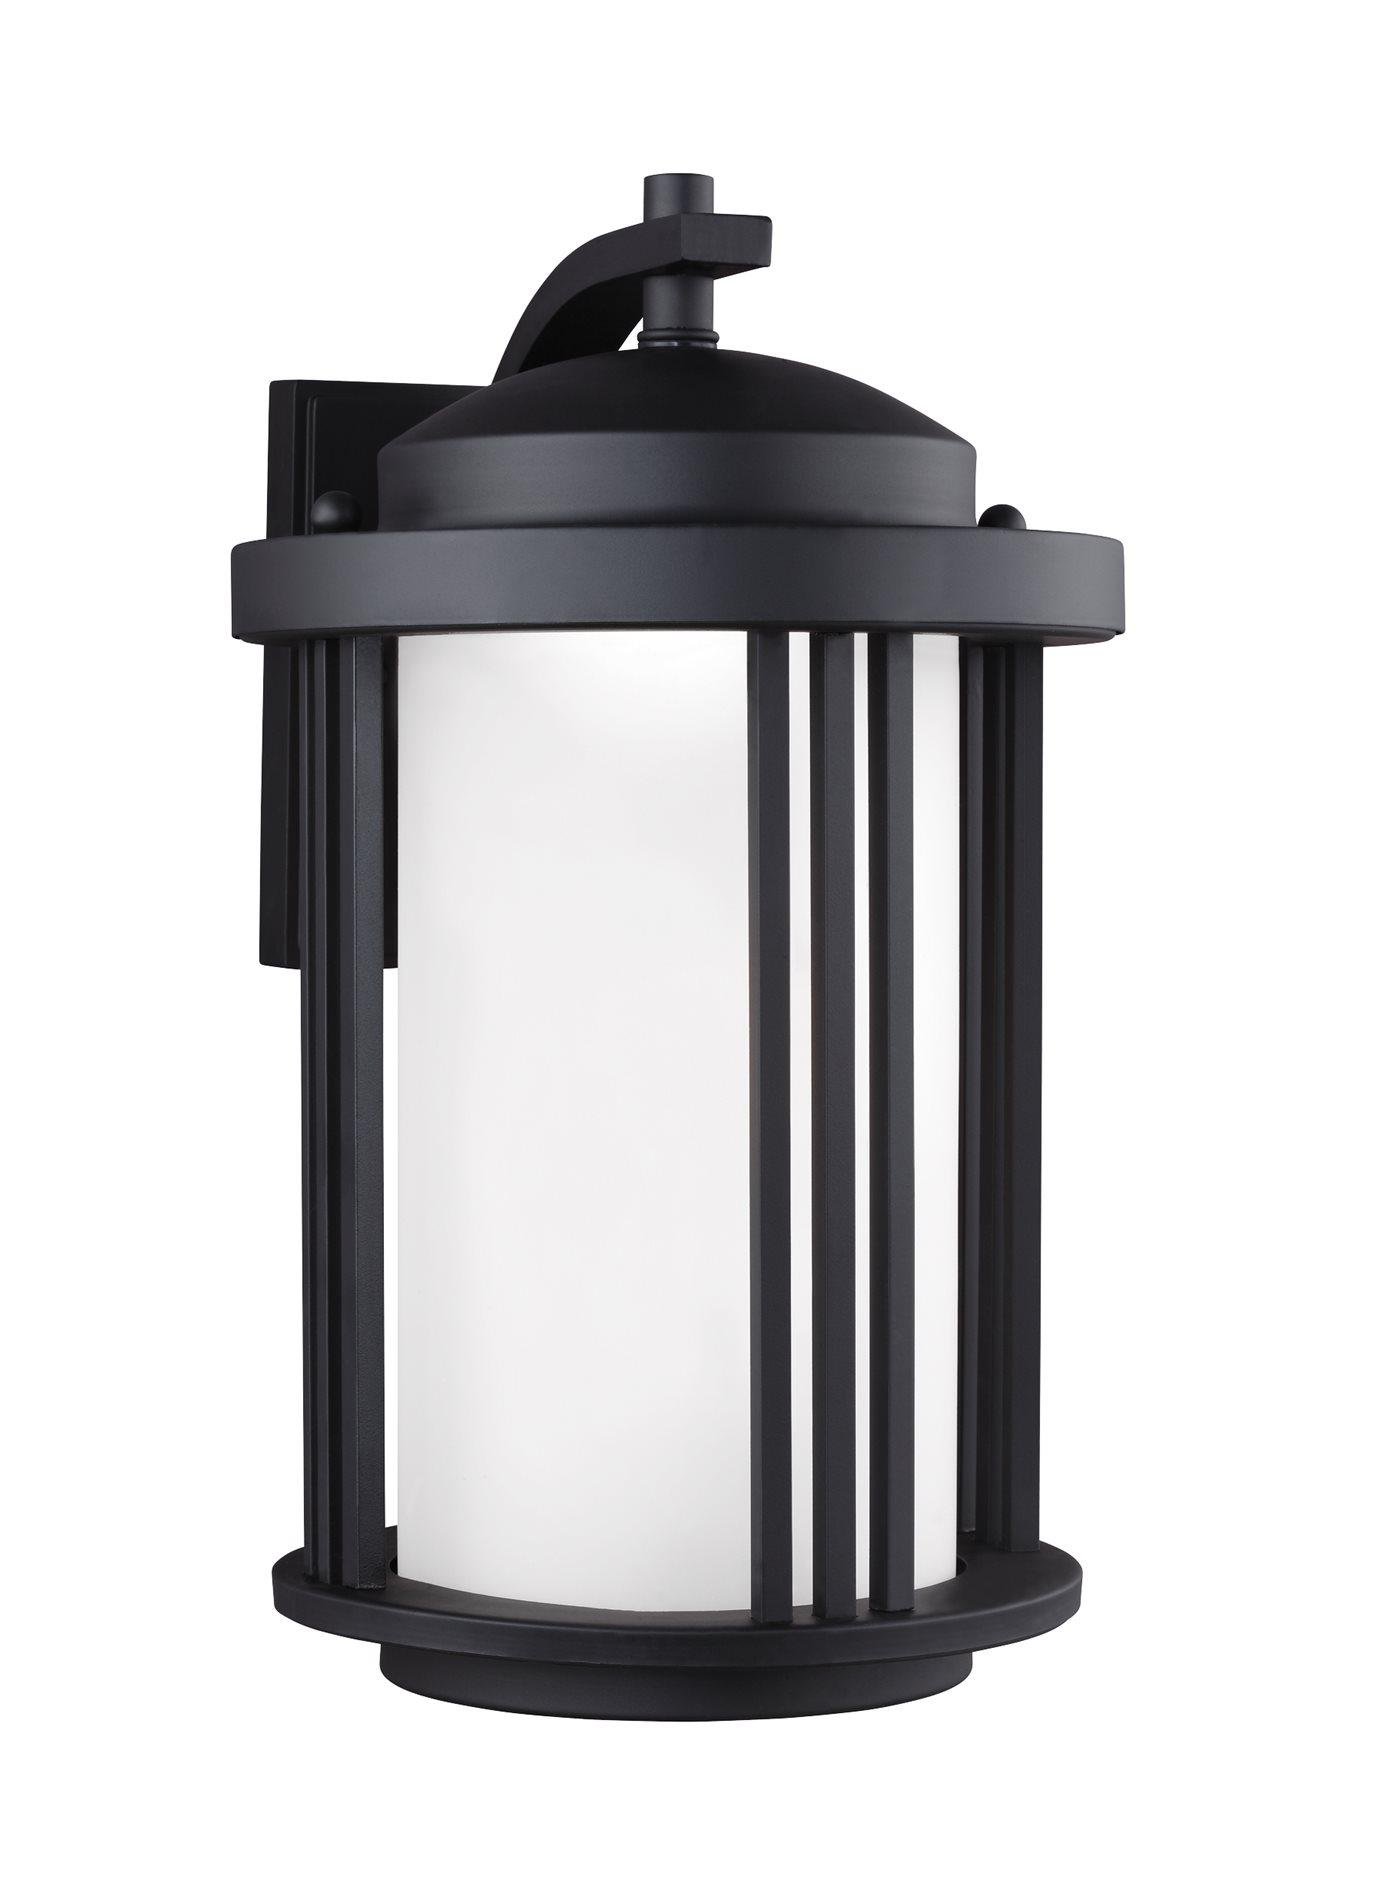 Sea Gull Lighting 8747991S 12 Crowell Modern Contemporary Lamp SG 8747991S 12